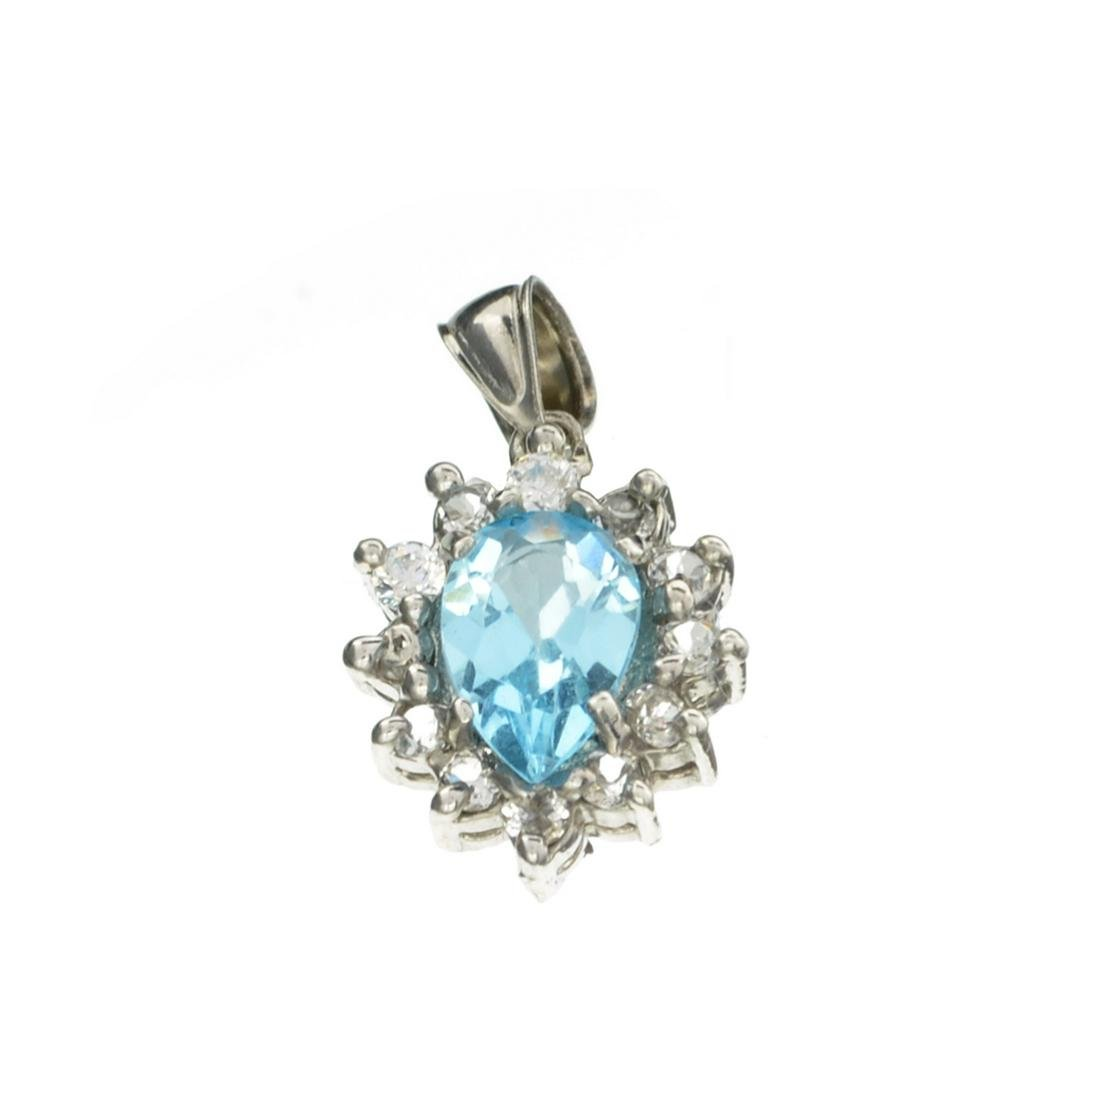 APP: 0.5k Fine Jewelry Designer Sebastian, 2.20CT Blue